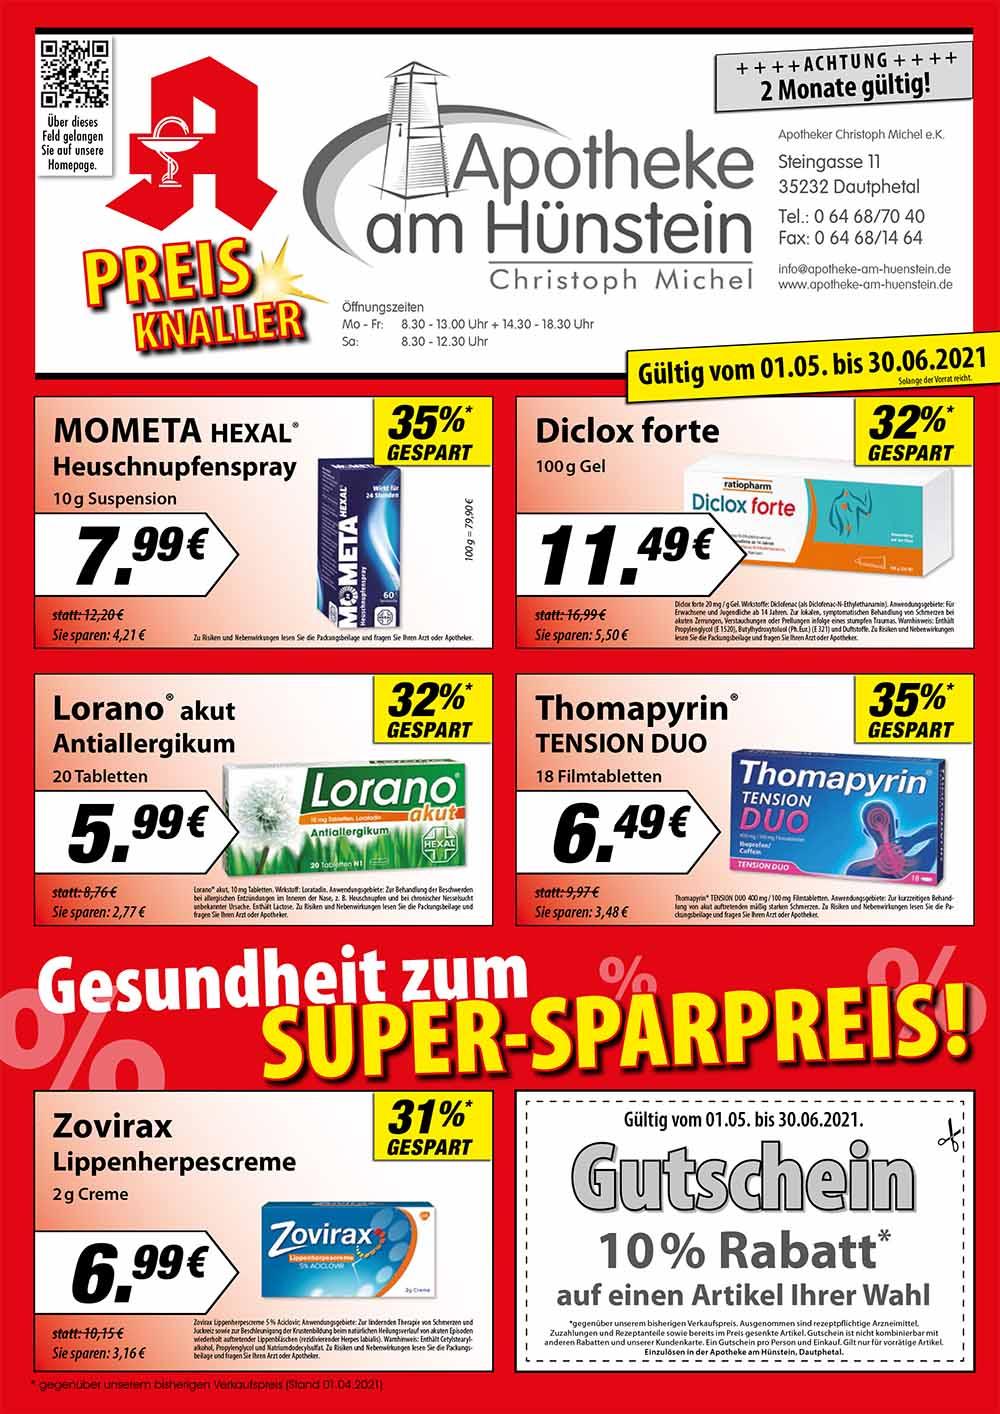 https://www-apotheken-de.apocdn.net/fileadmin/clubarea/00000-Angebote/35232_11932_am_huenstein_angebot_1.jpg